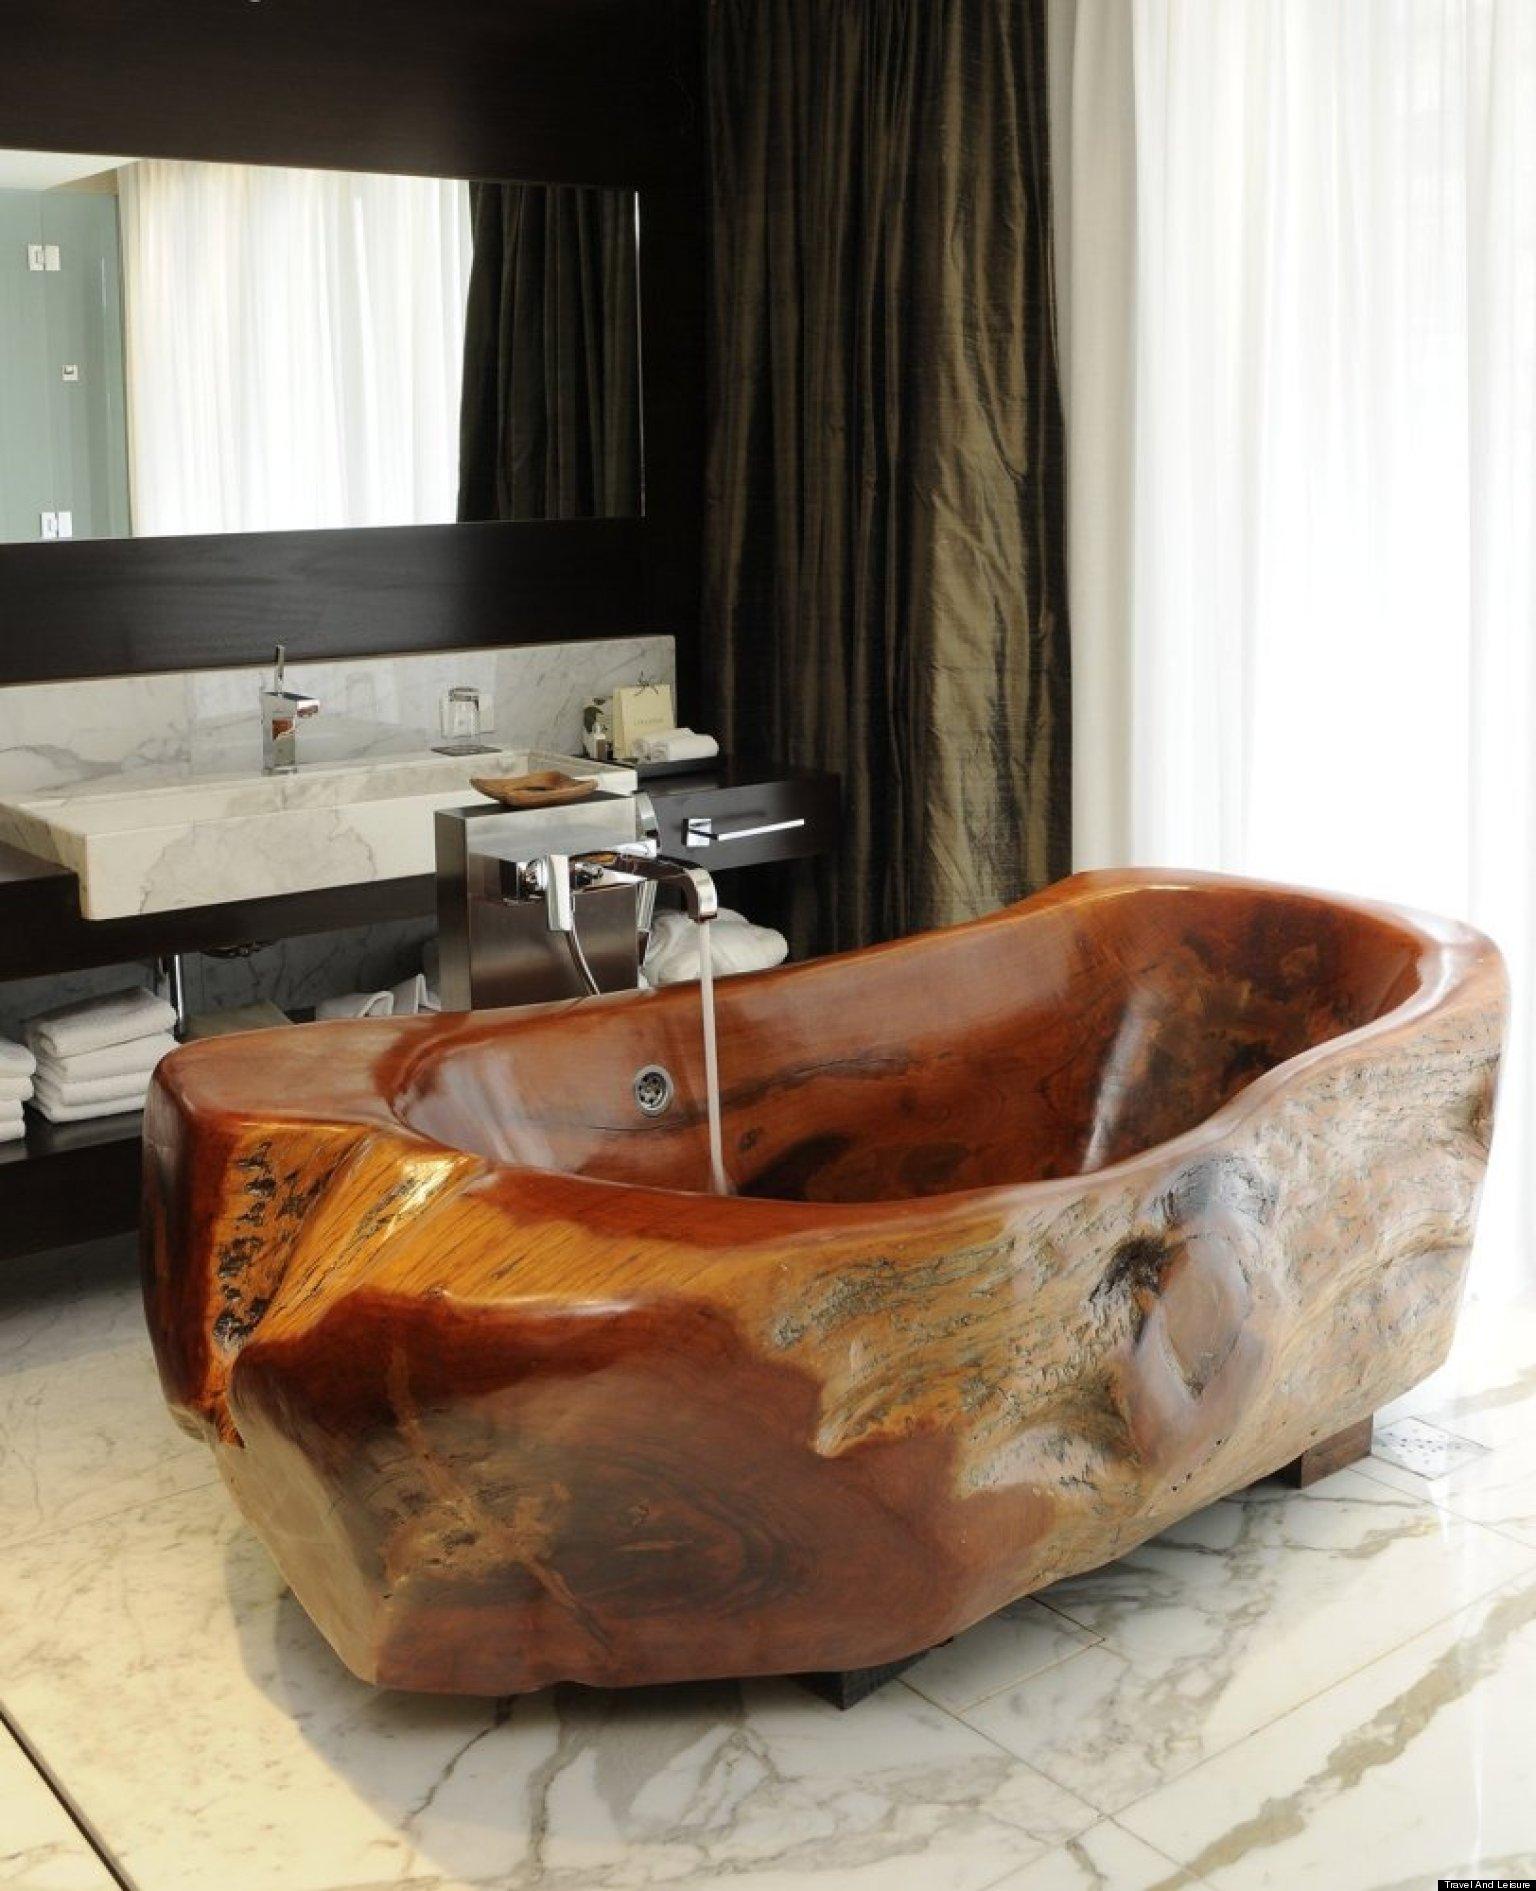 World's Coolest Hotel Bathtubs (PHOTOS)